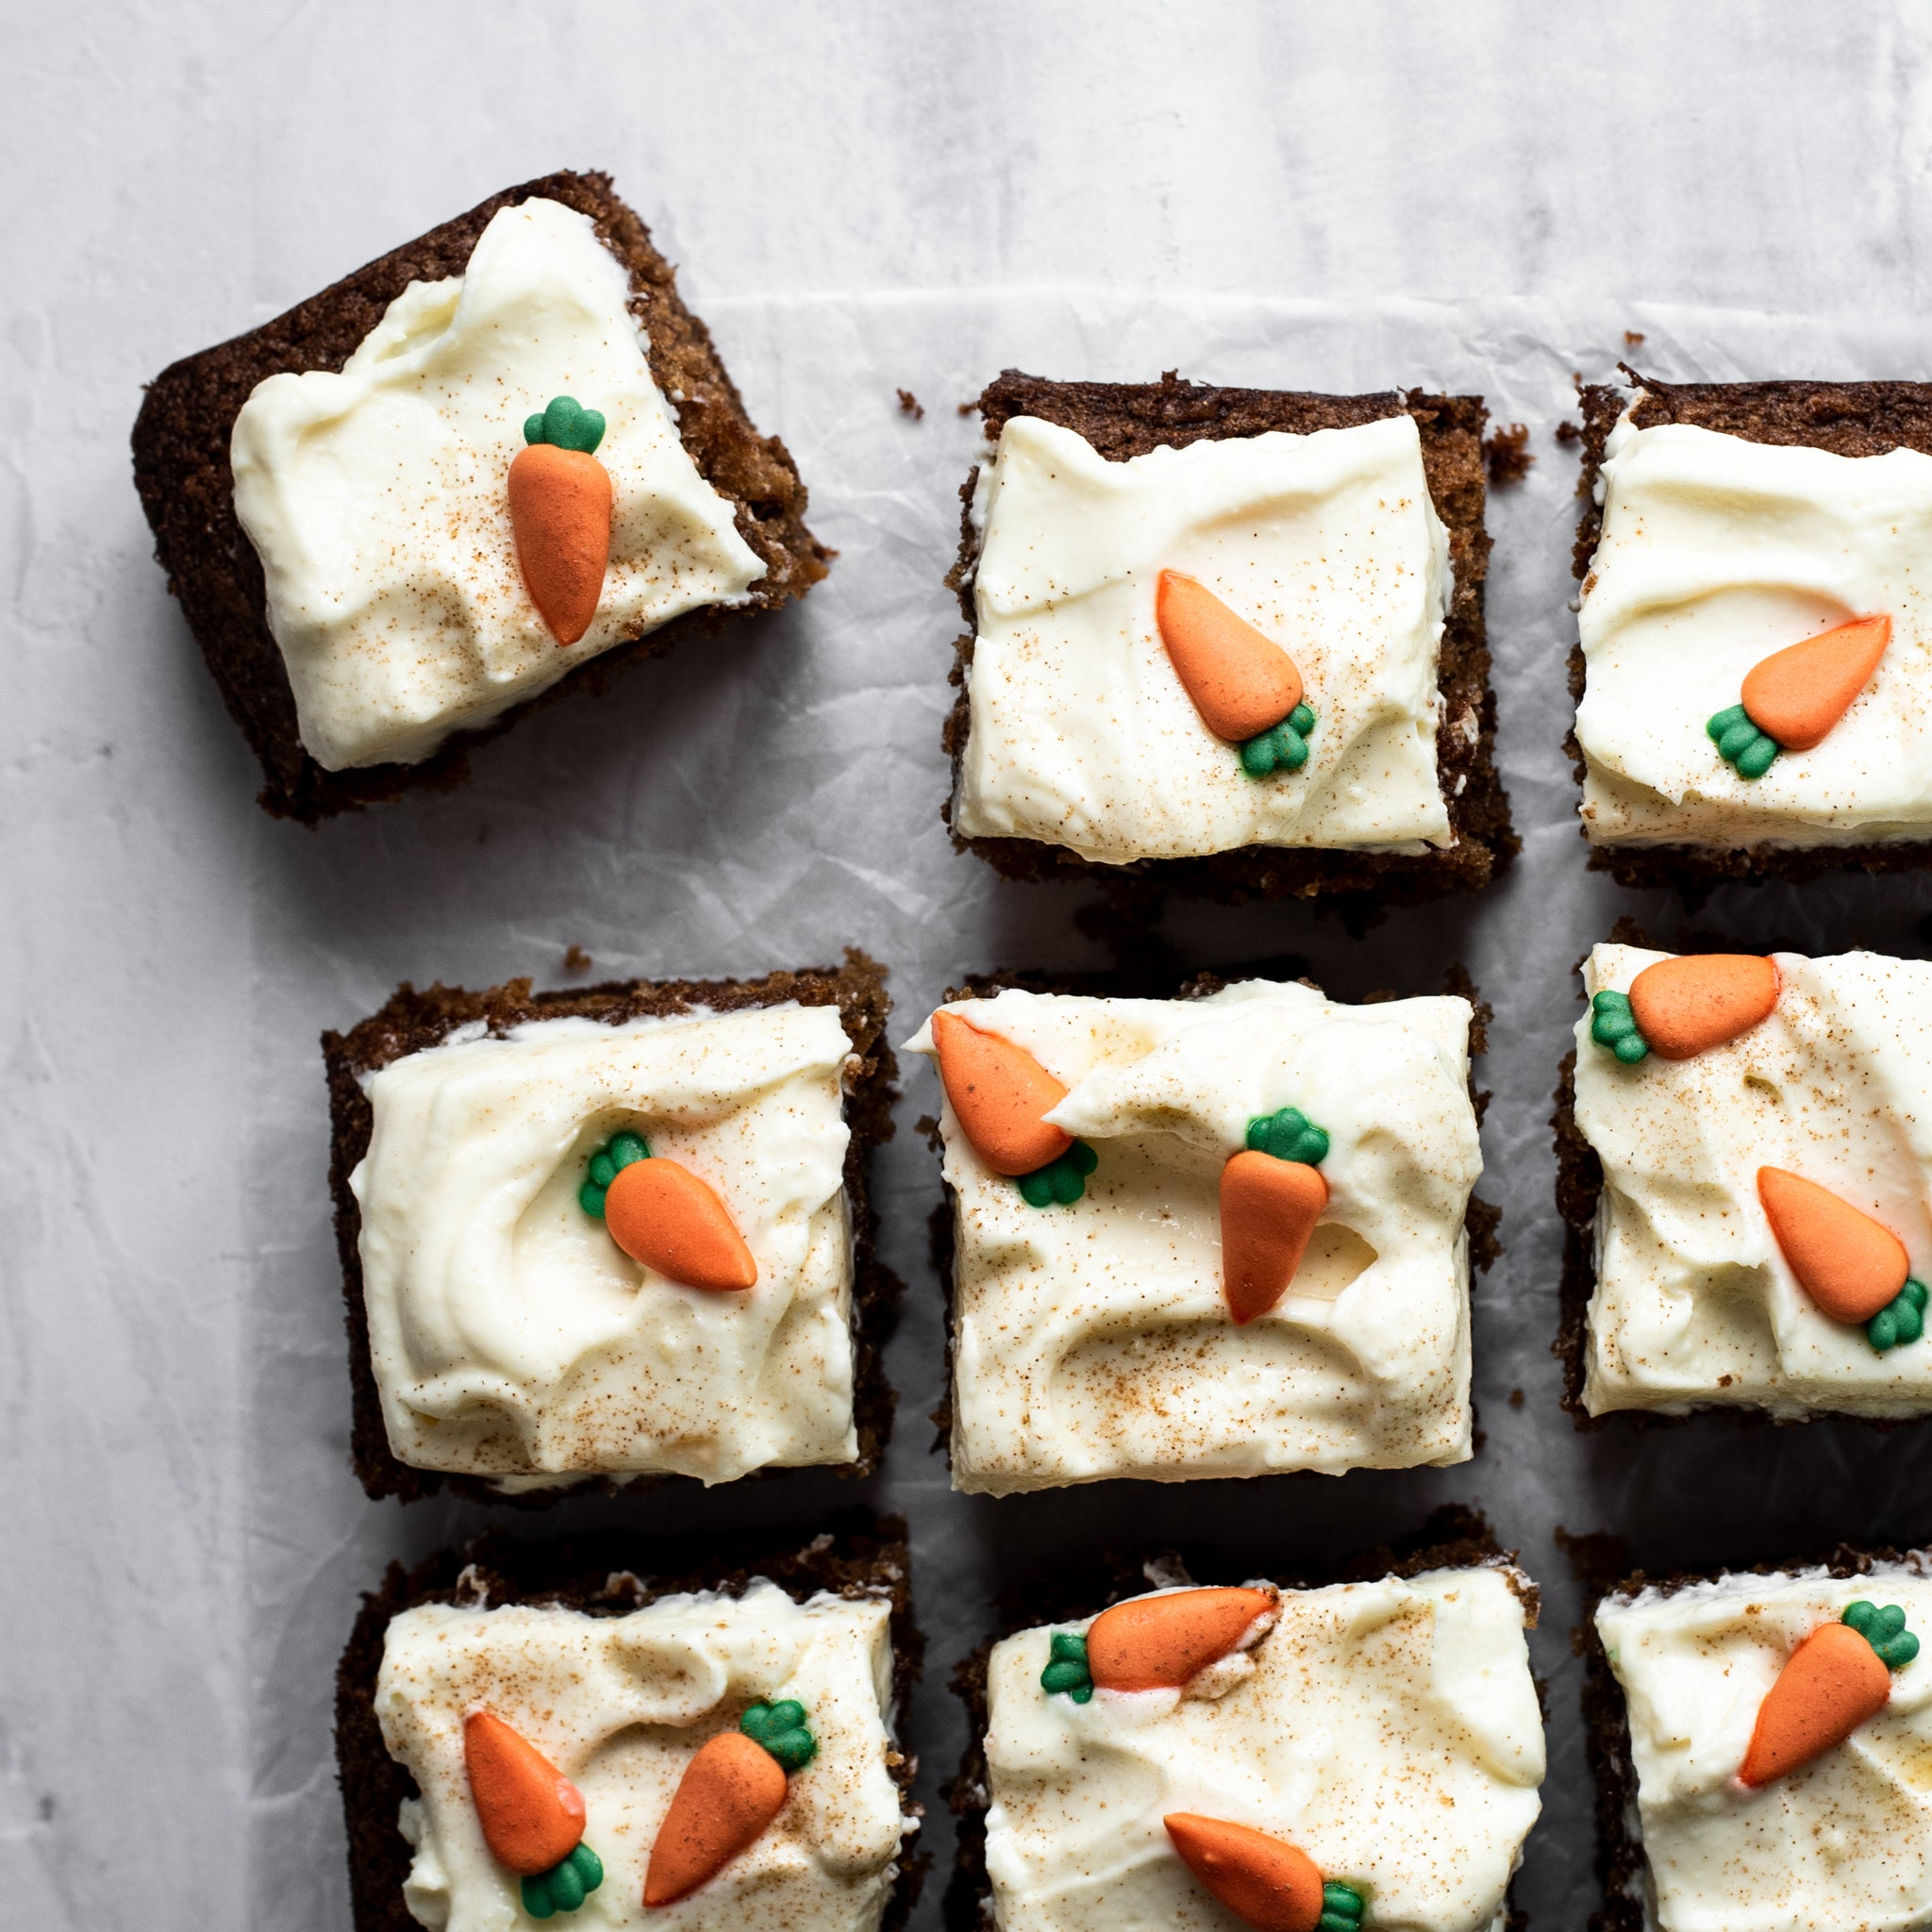 Carrot-Cake-Tray-Bake-SQUARE-4.jpg